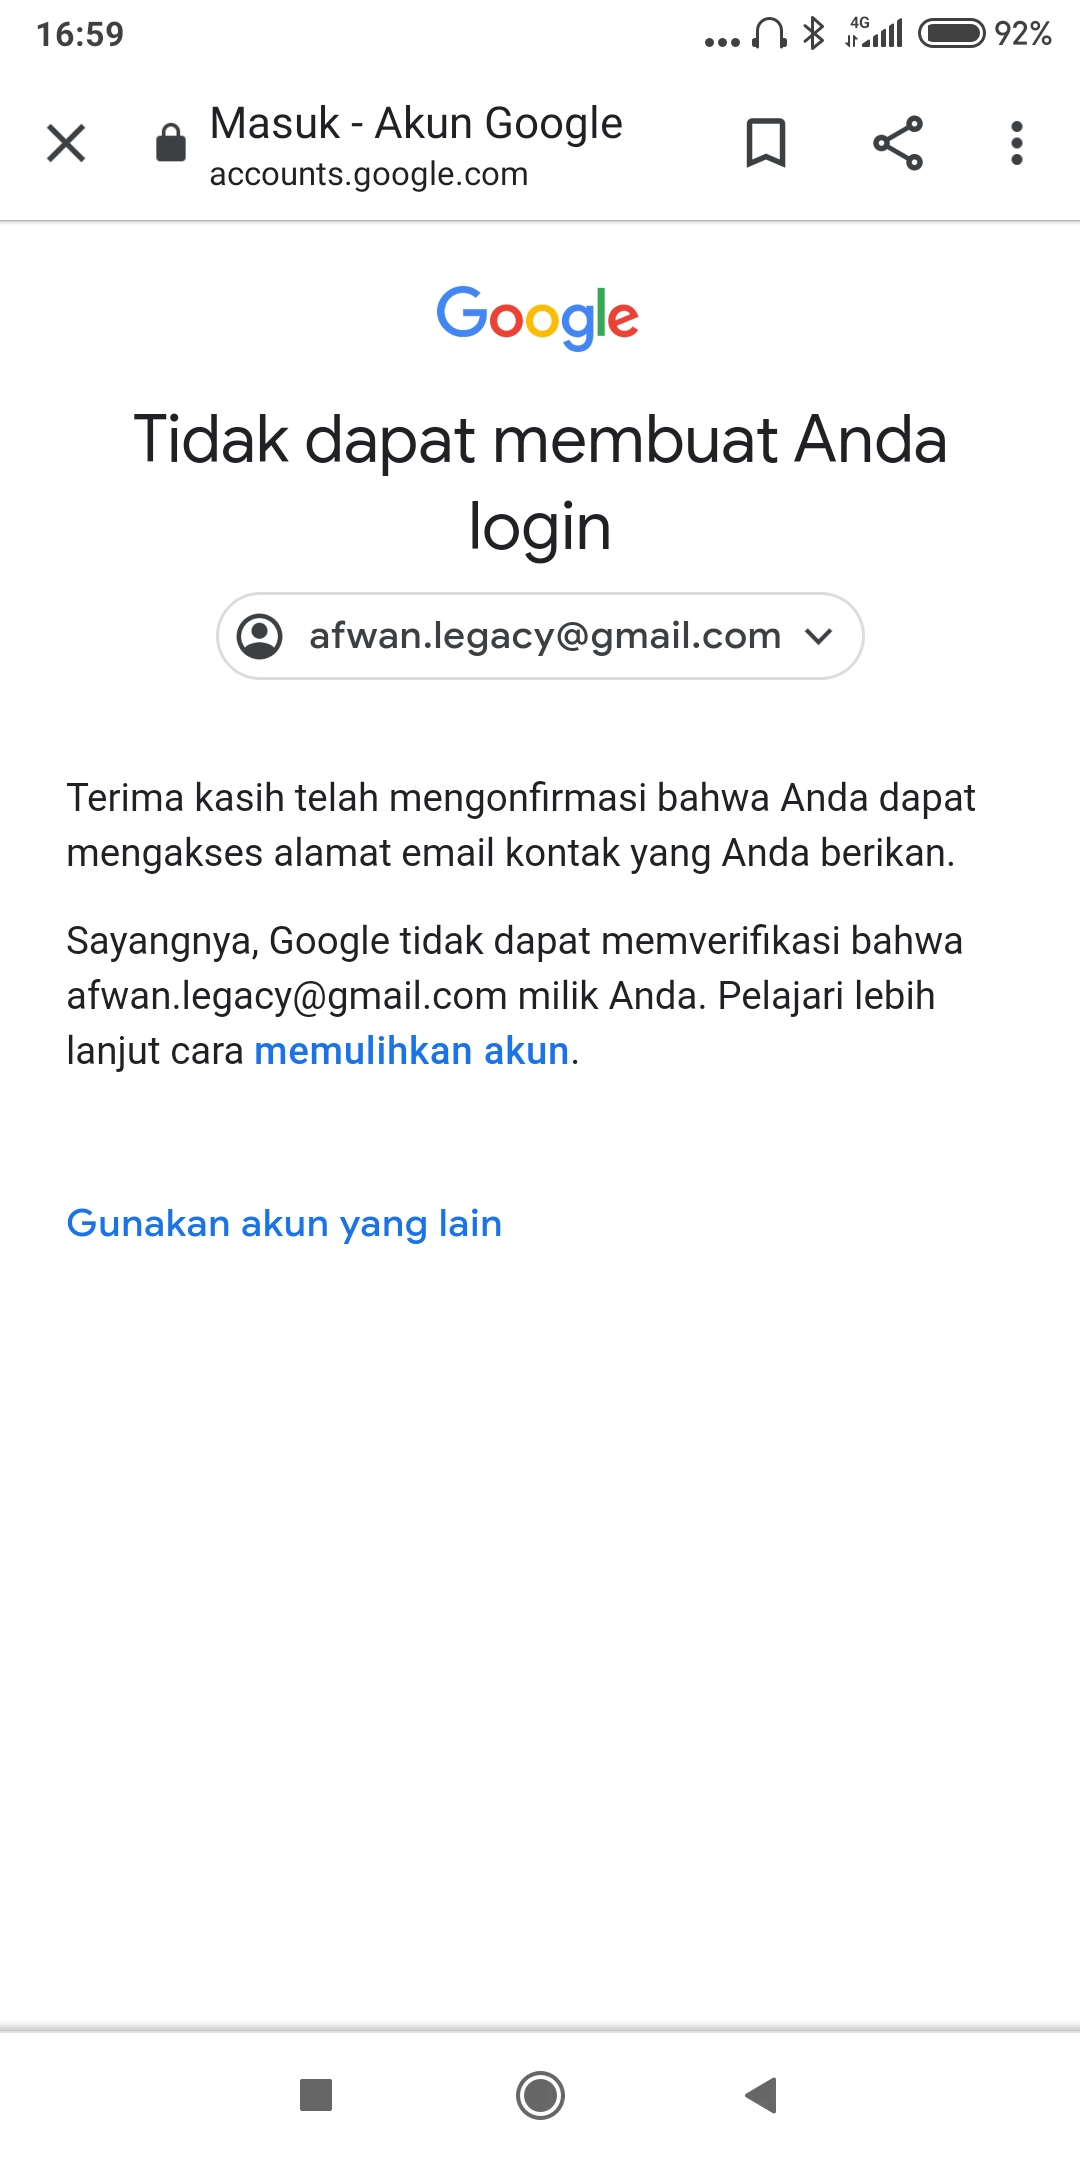 Akun Gmail Lupa Password Dan Nomer Hp Hangus Komunitas Akun Google